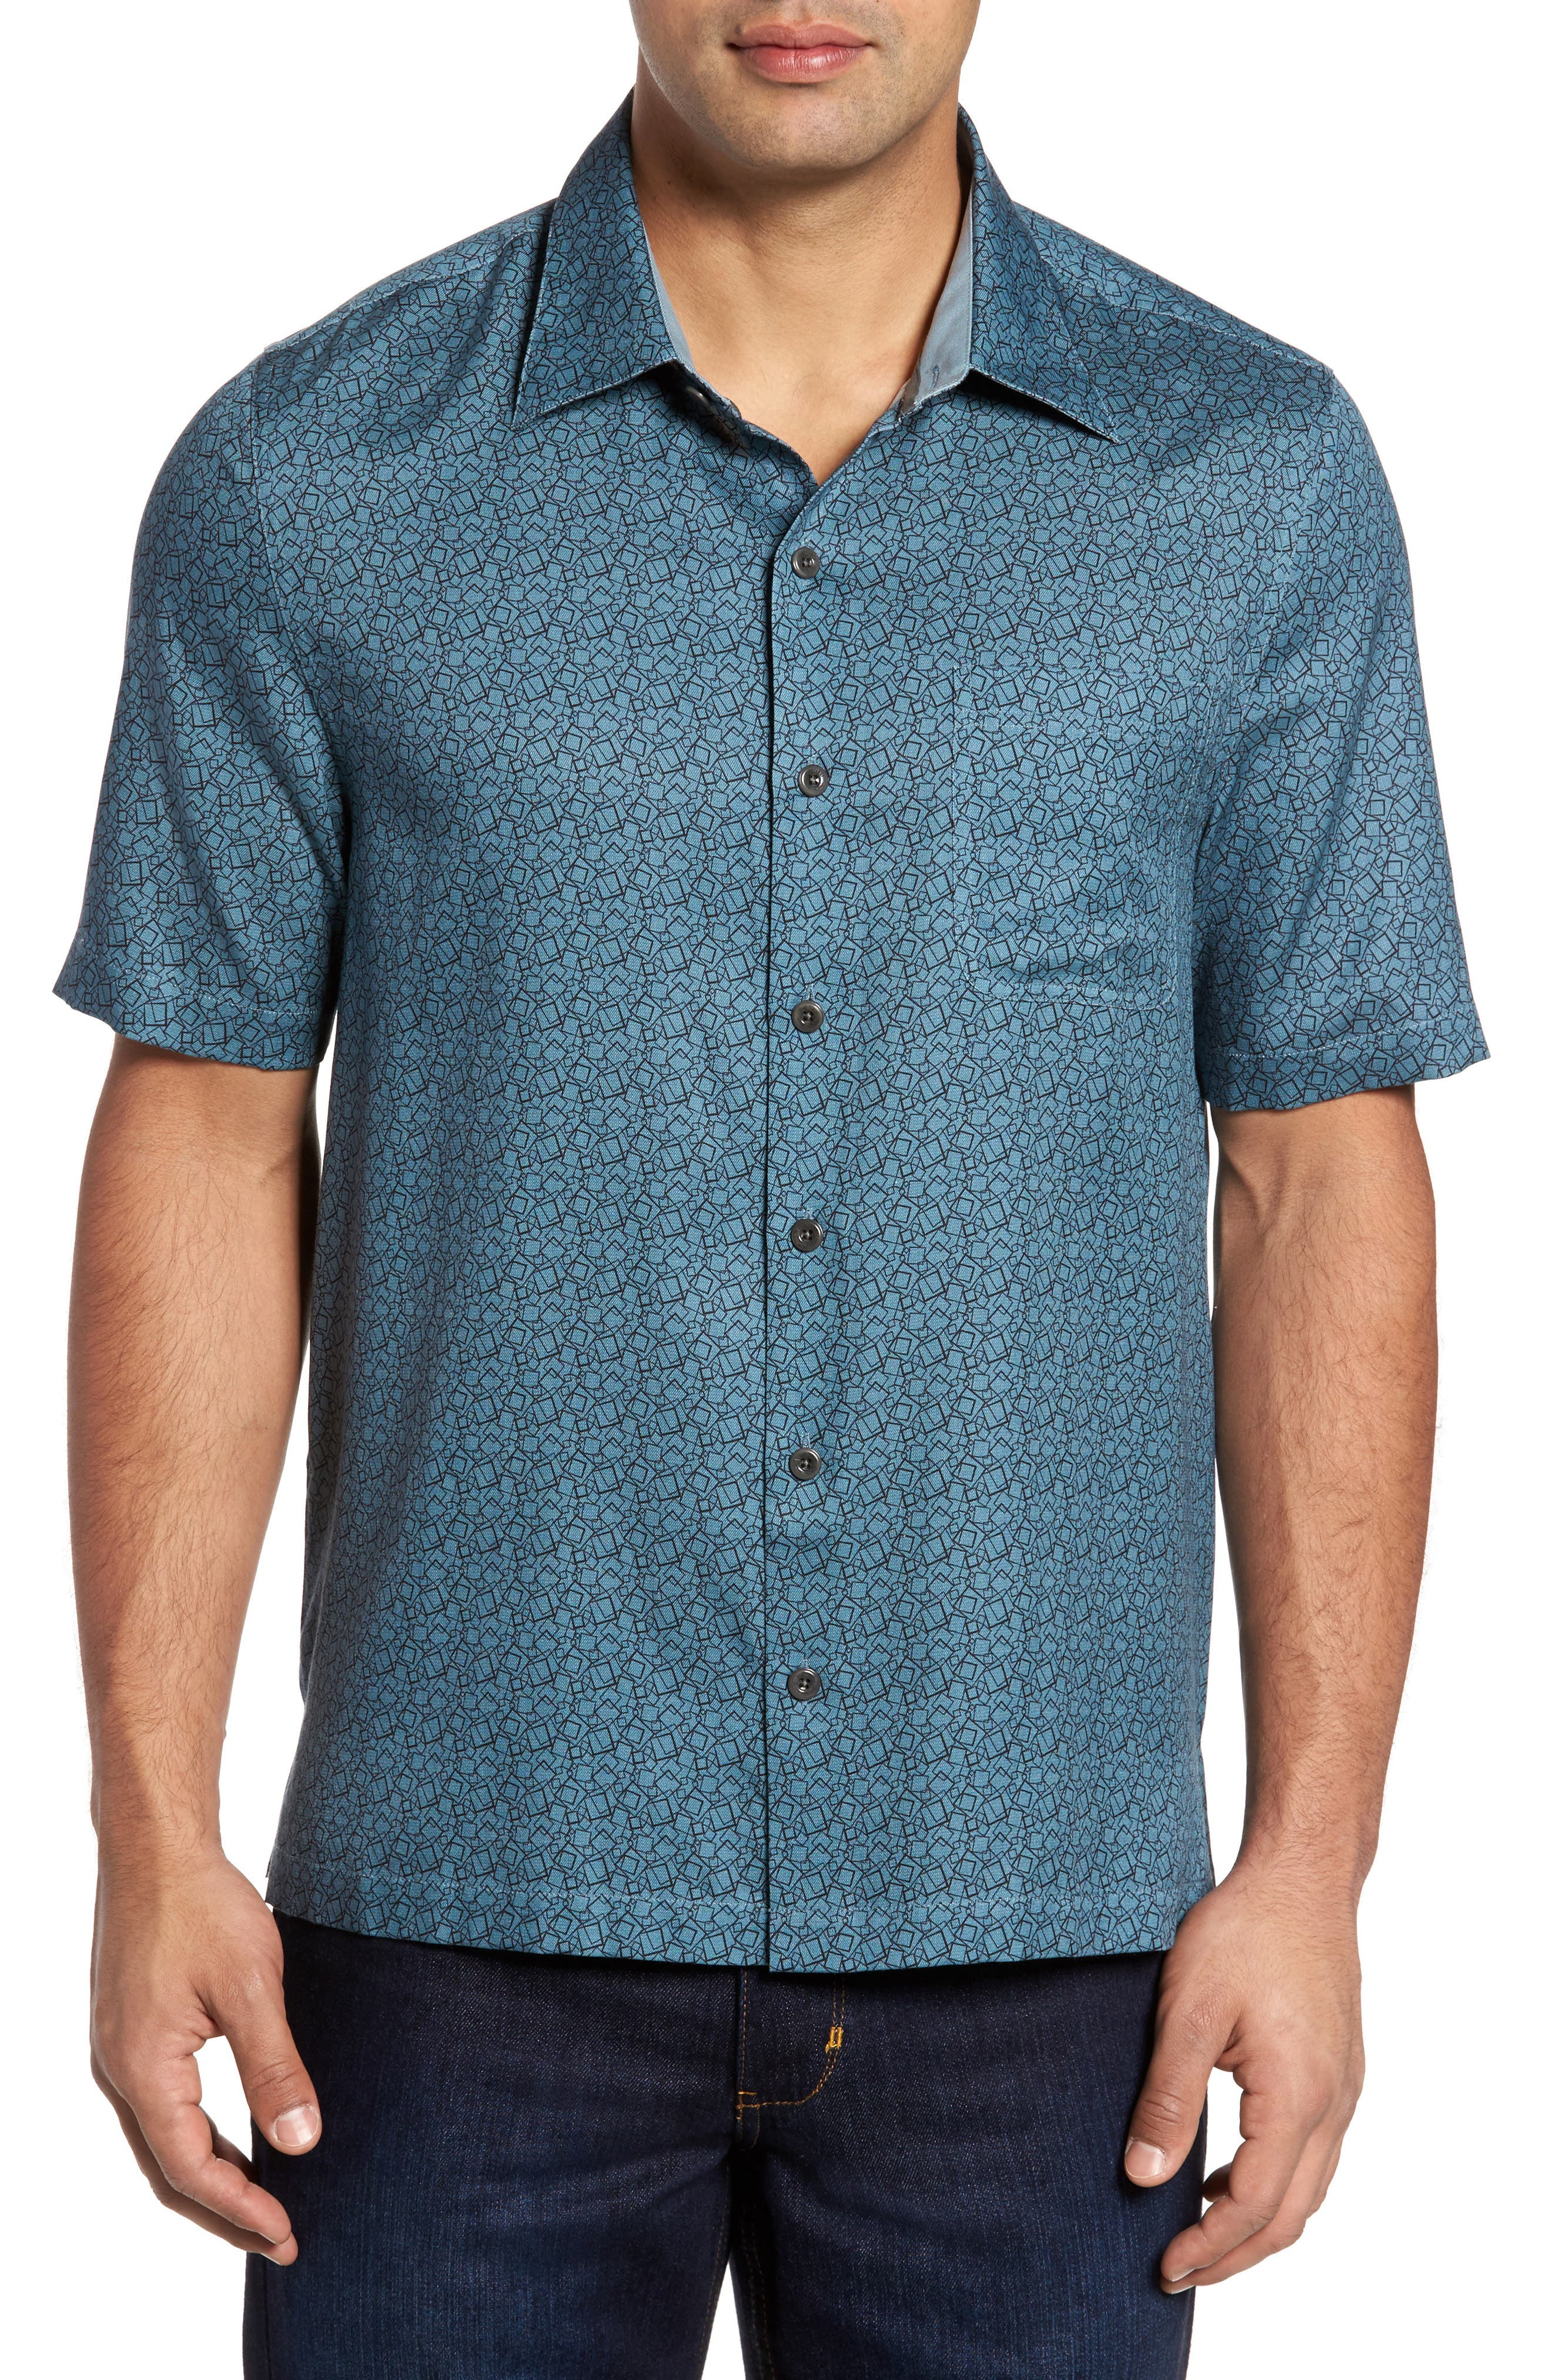 Alternate Image 1 Selected - Nat Nast Blizzard Classic Fit Silk Blend Sport Shirt